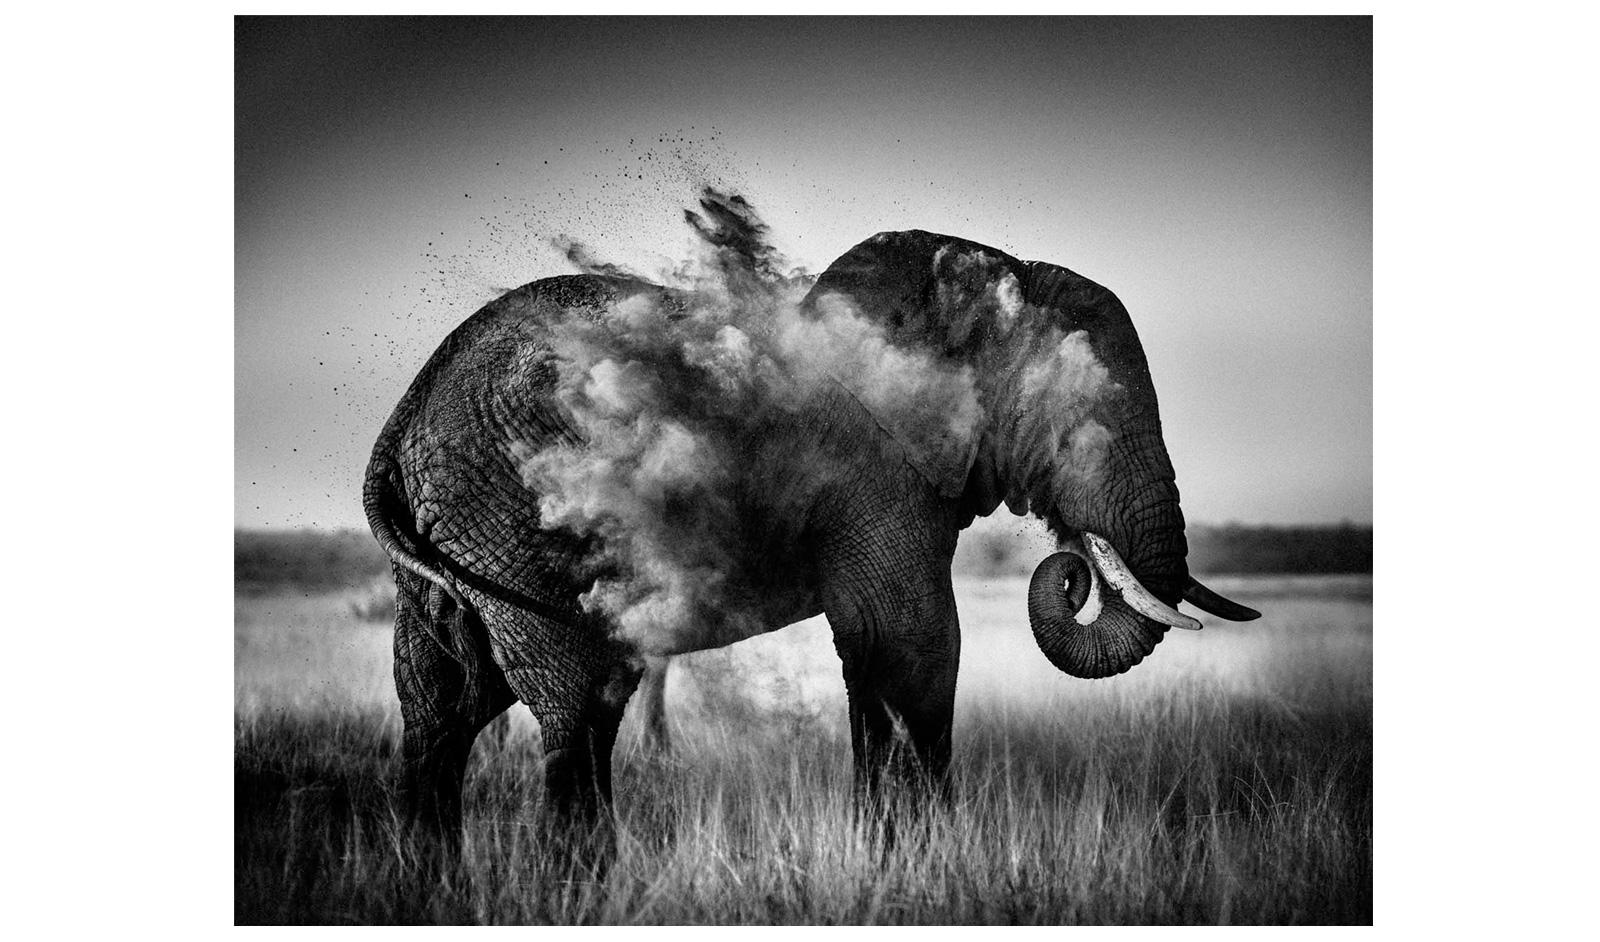 Black And White Photography Magazine 16 Desktop Wallpaper